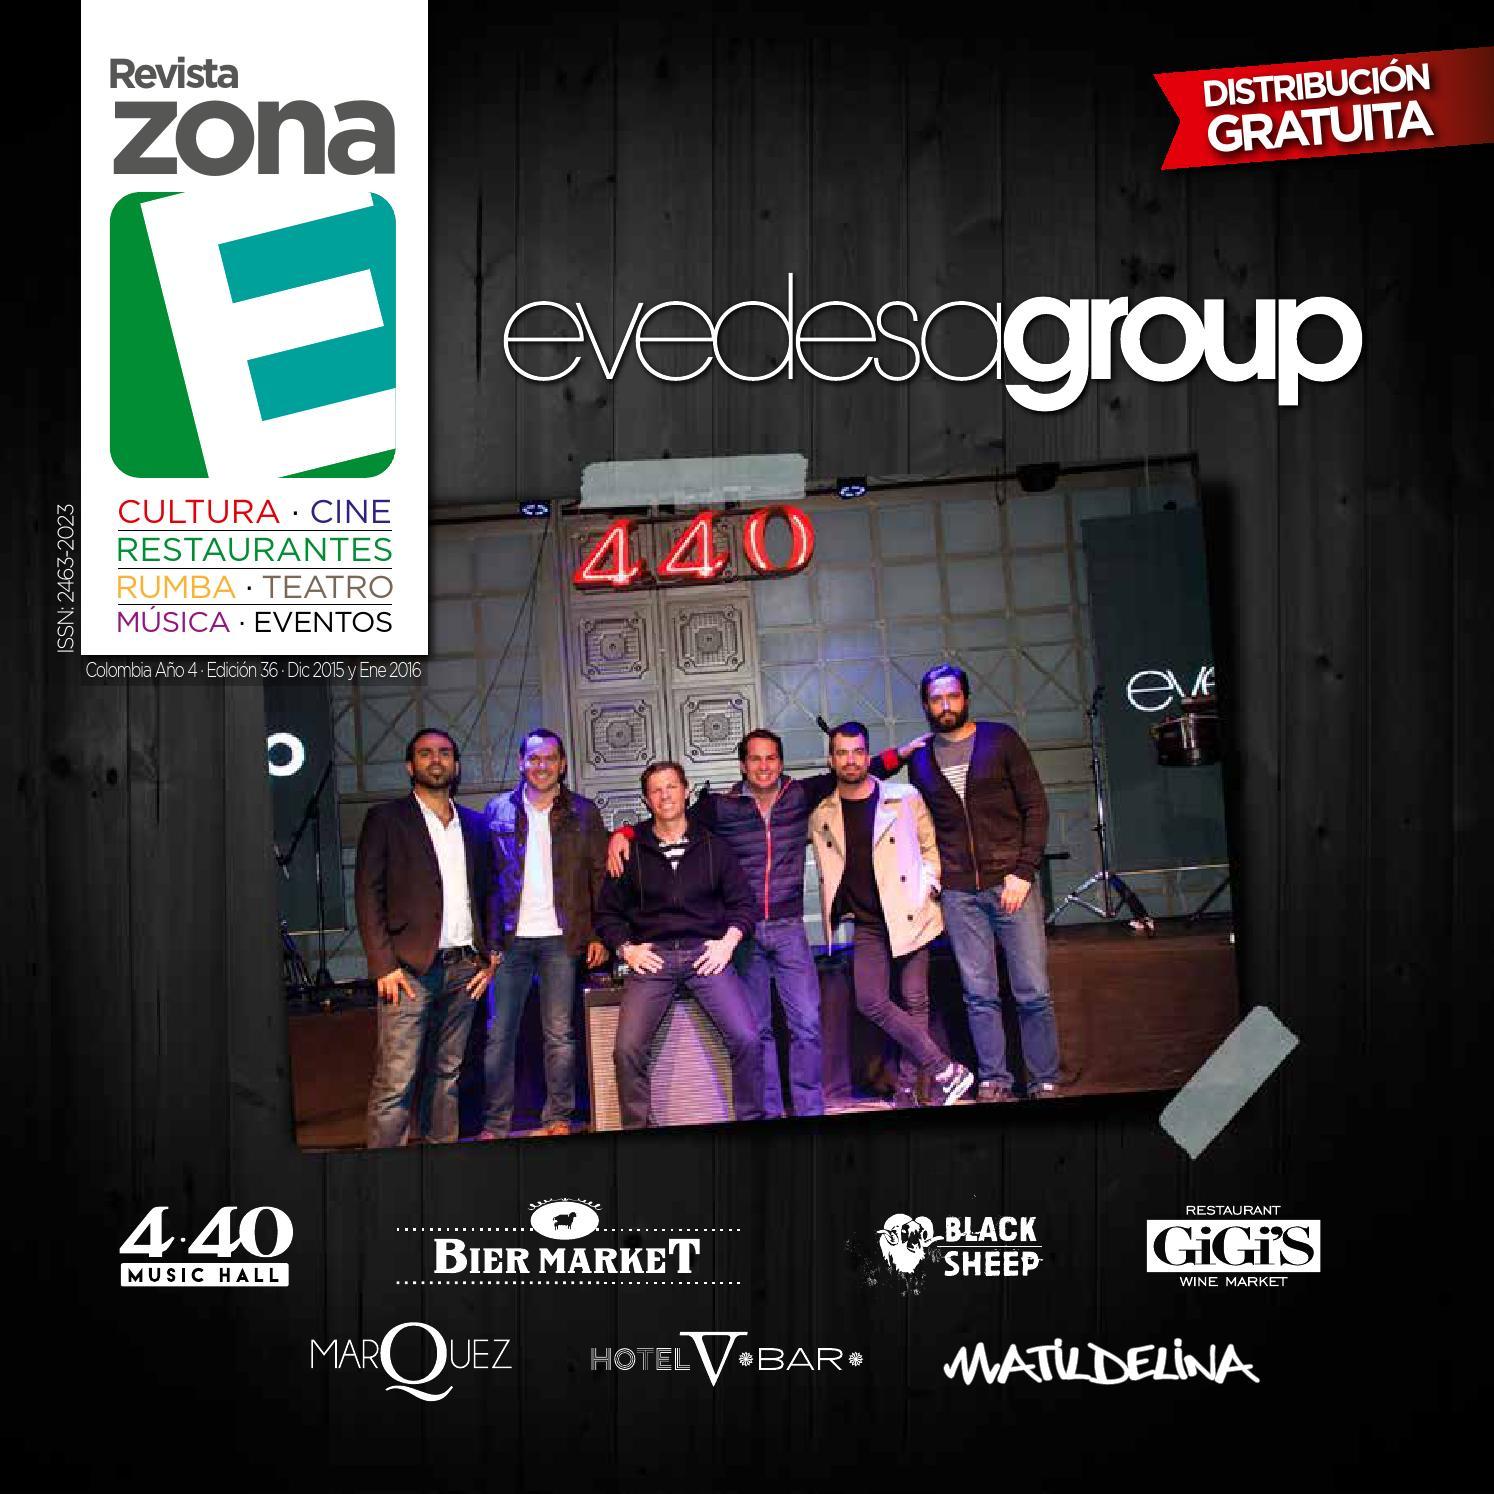 4c4e202daab Revista Zona E Diciembre 2015 by Revista Zona E - issuu